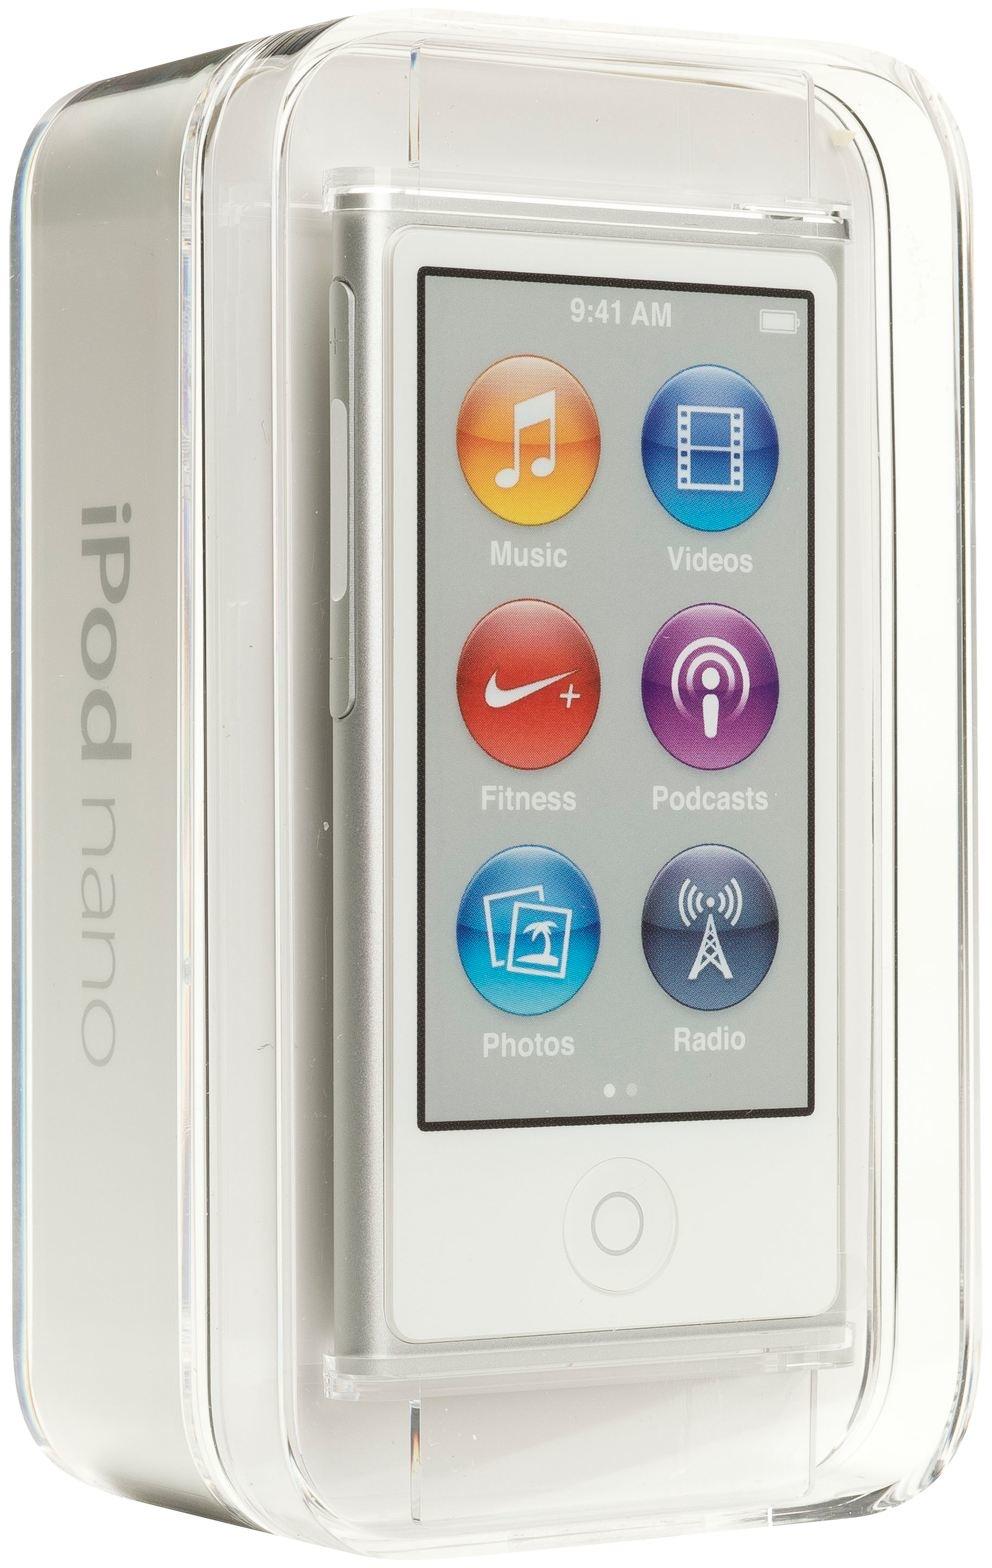 Embalagem do iPod nano (7G)